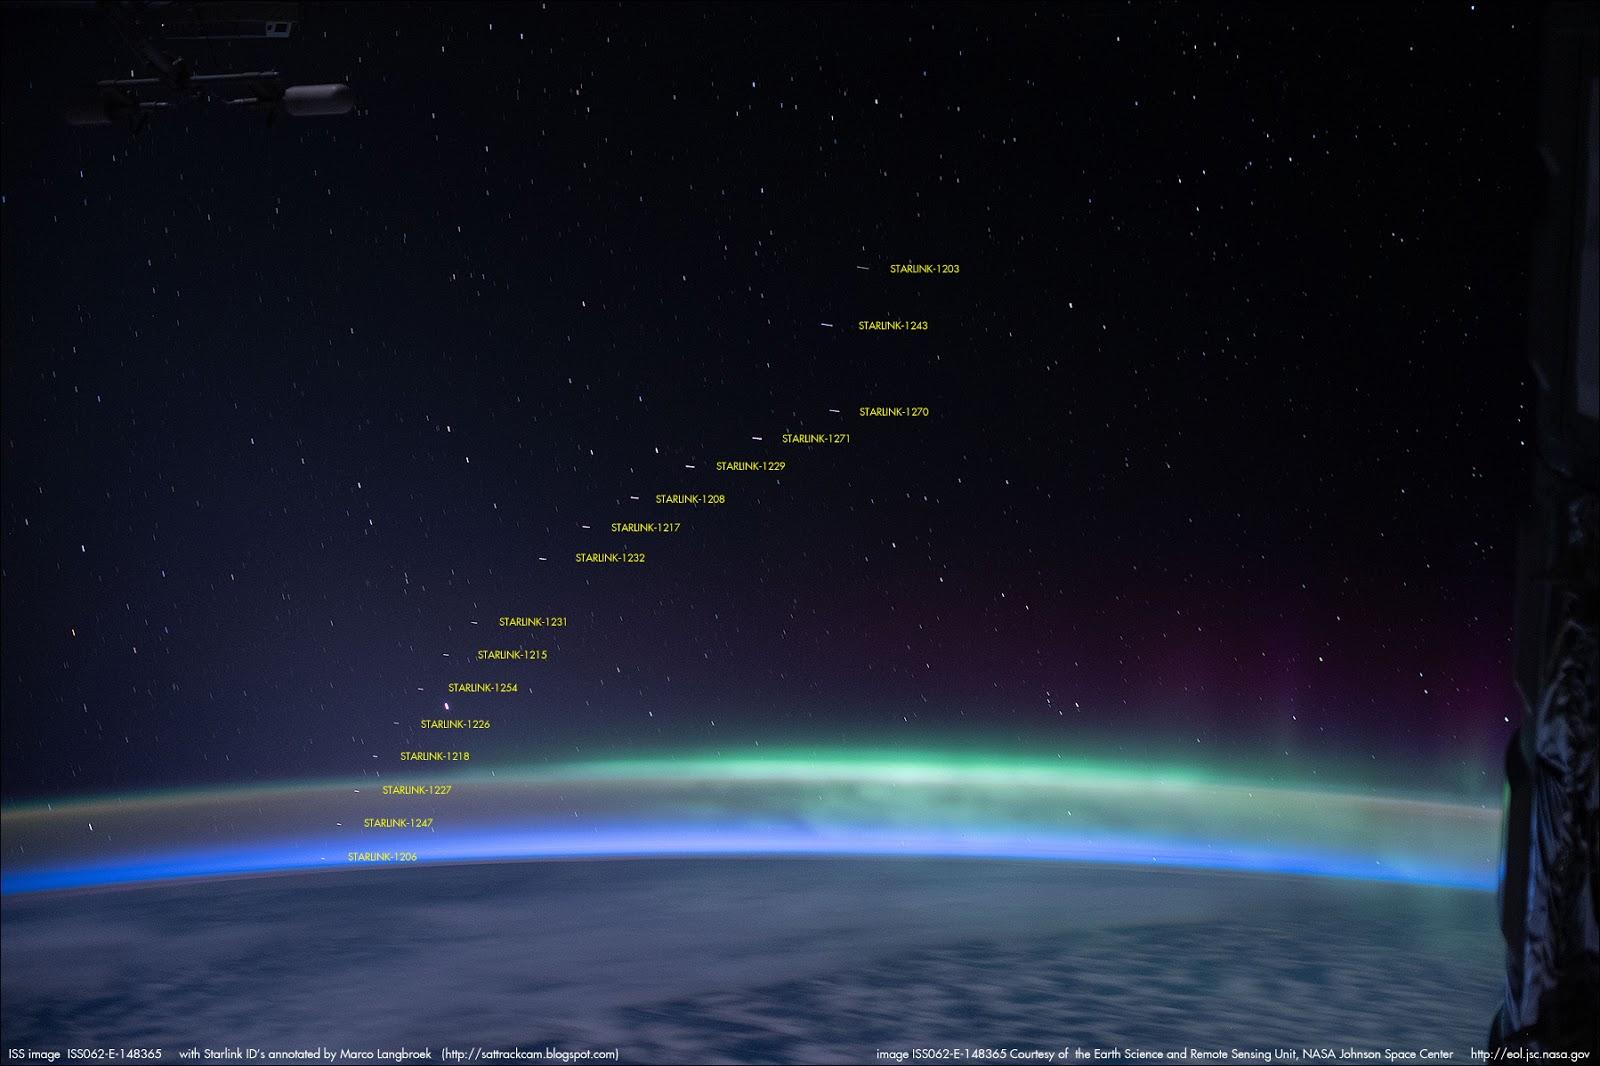 ISS/ NASA